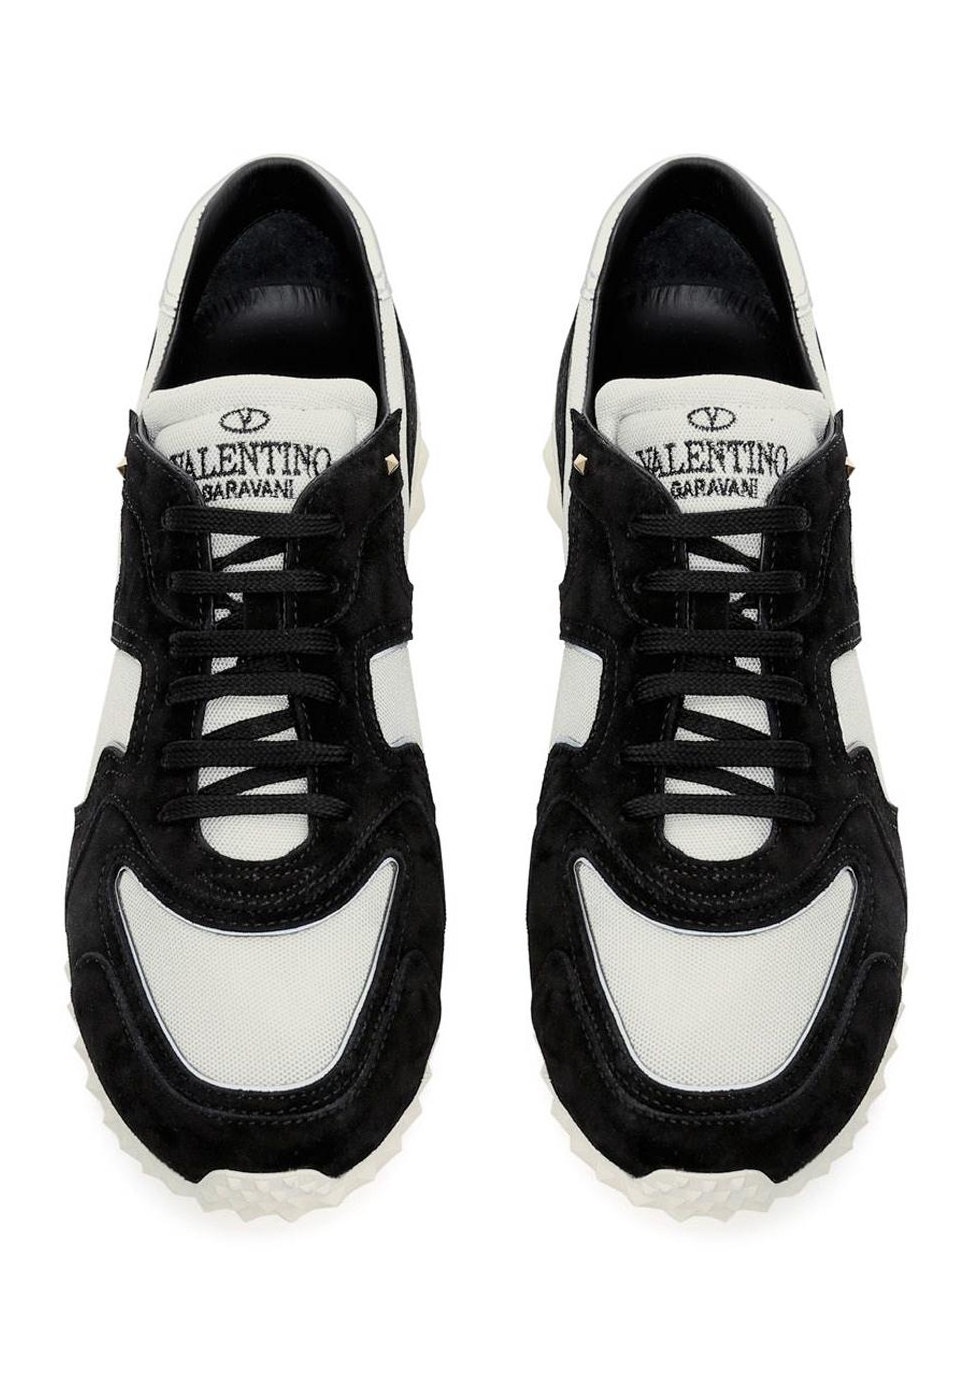 Tissu Baskets Boutique Blanc Homme Cuir Valentino Italian Noir En Et  xqYq1Wan 2d150cbed7a